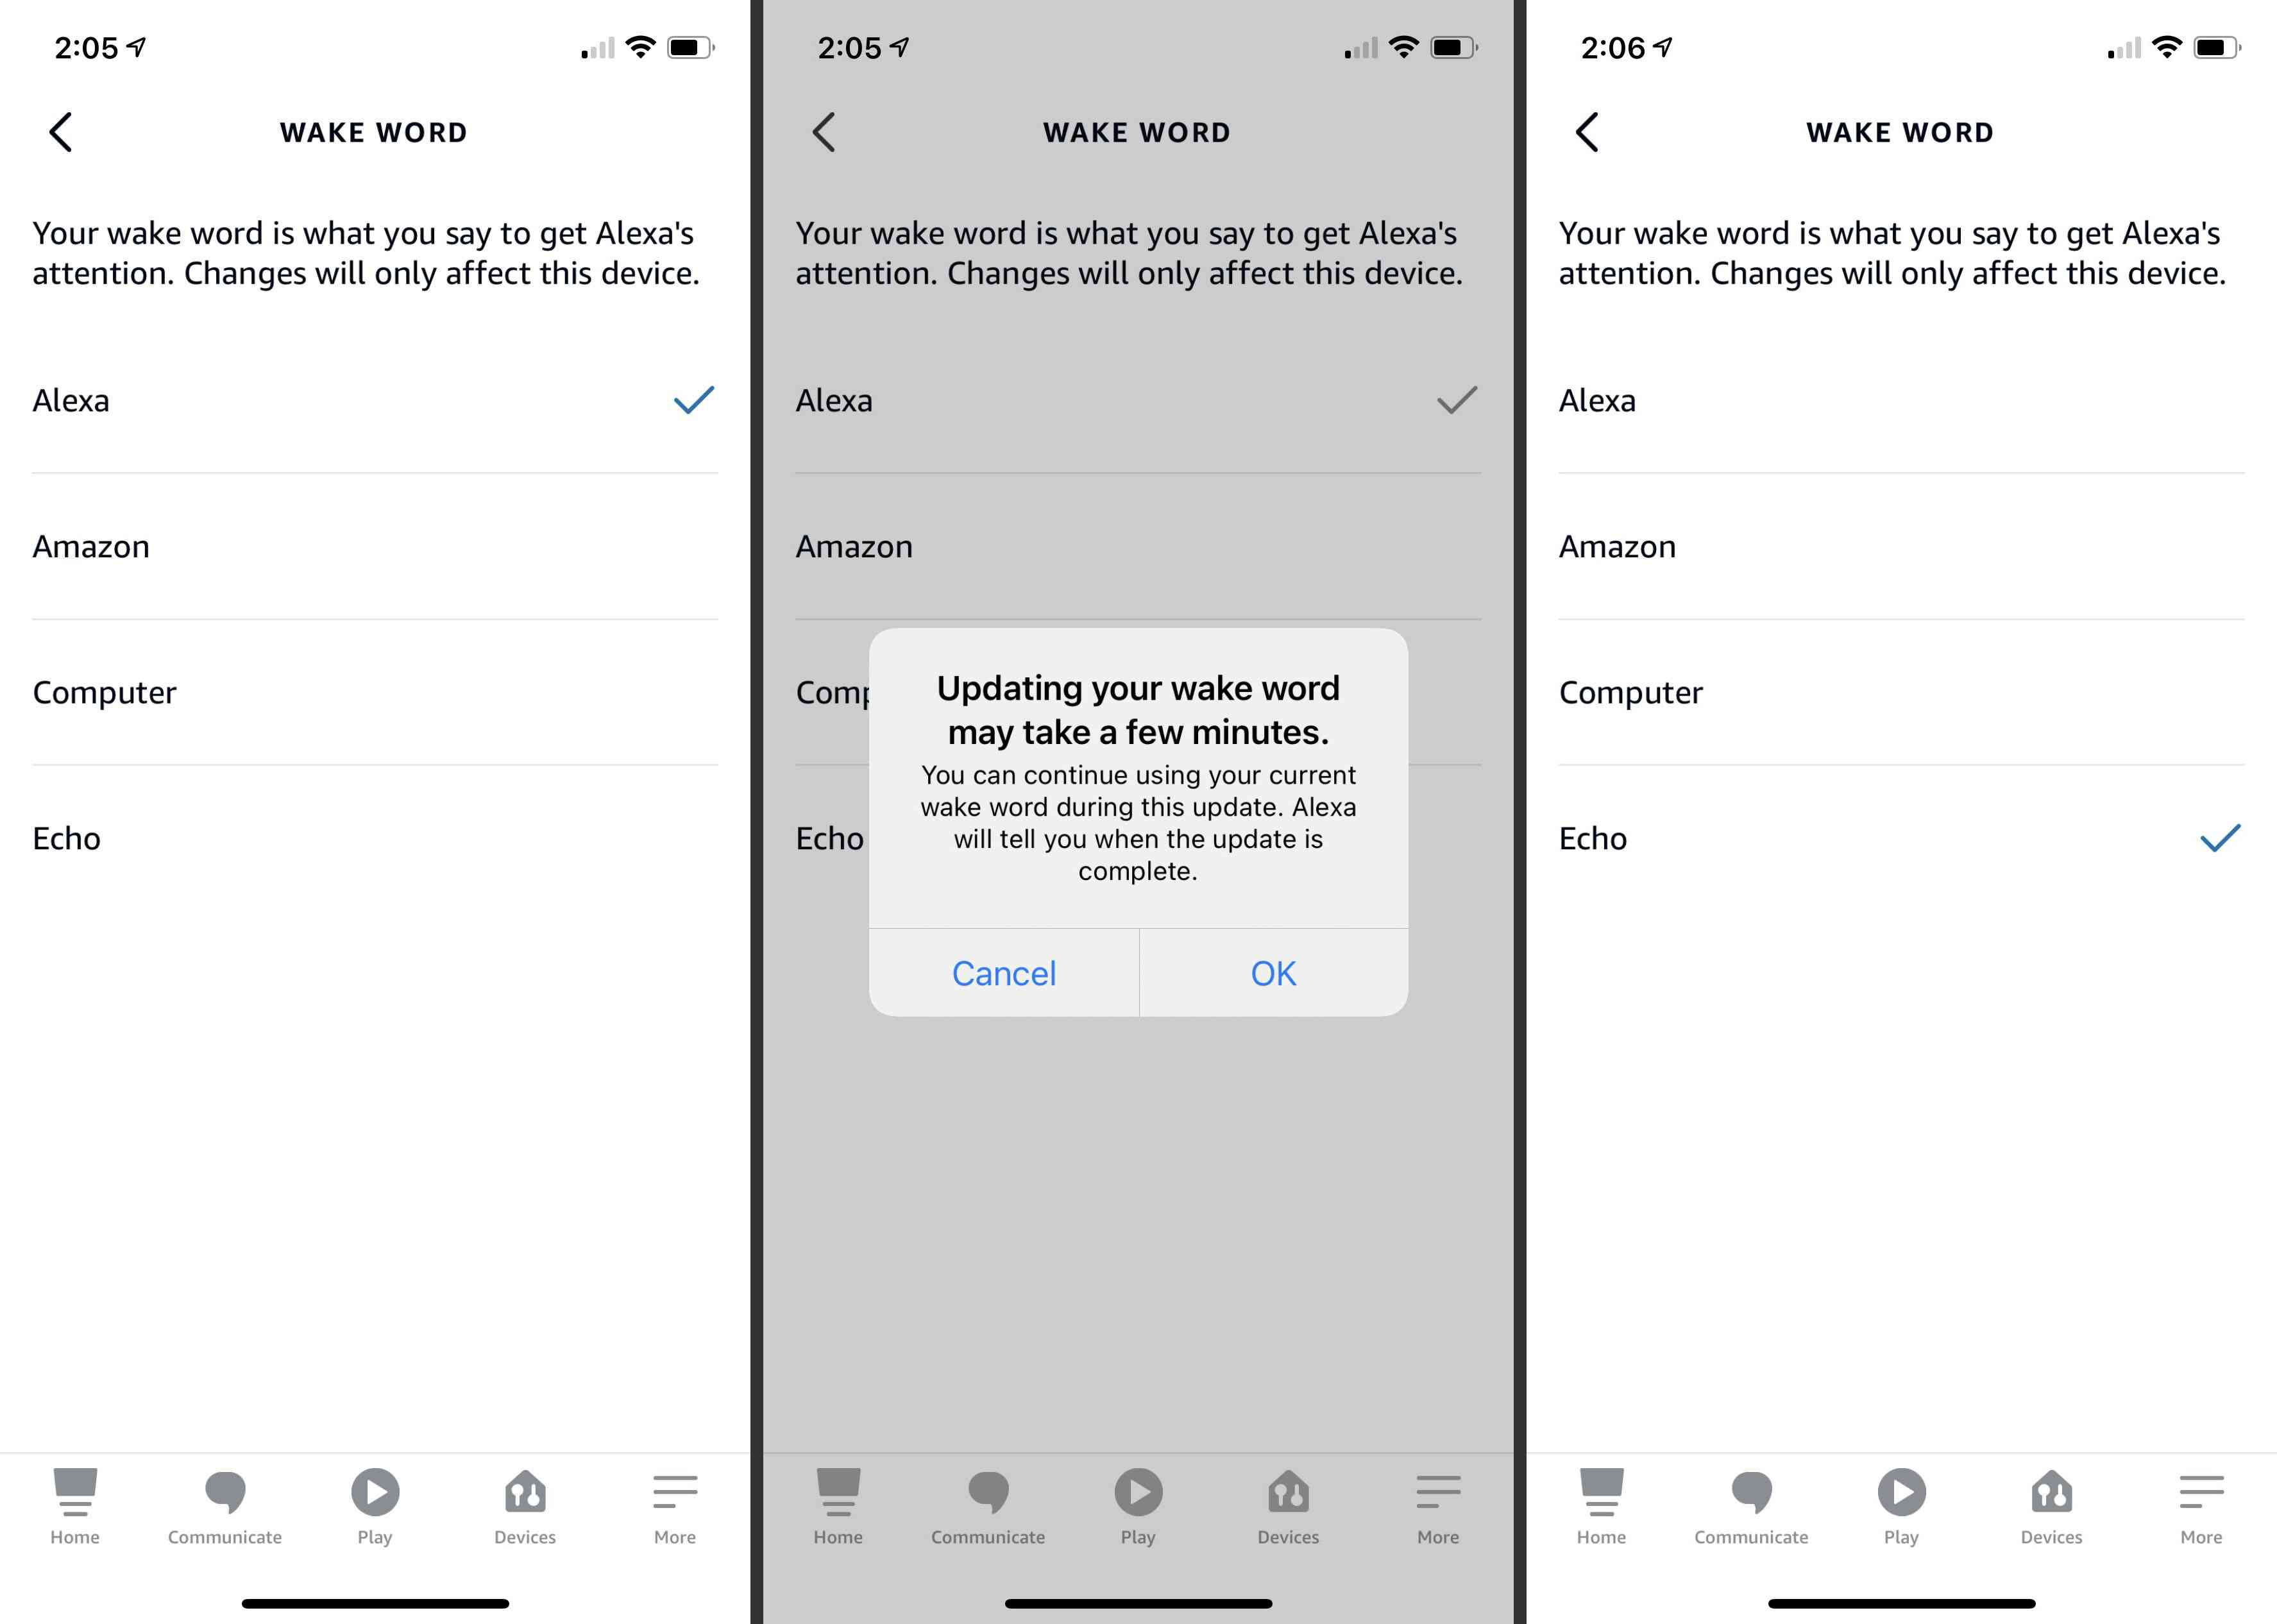 Steps to change the Alexa wake work from Alexa to Echo on the Alexa mobile app.